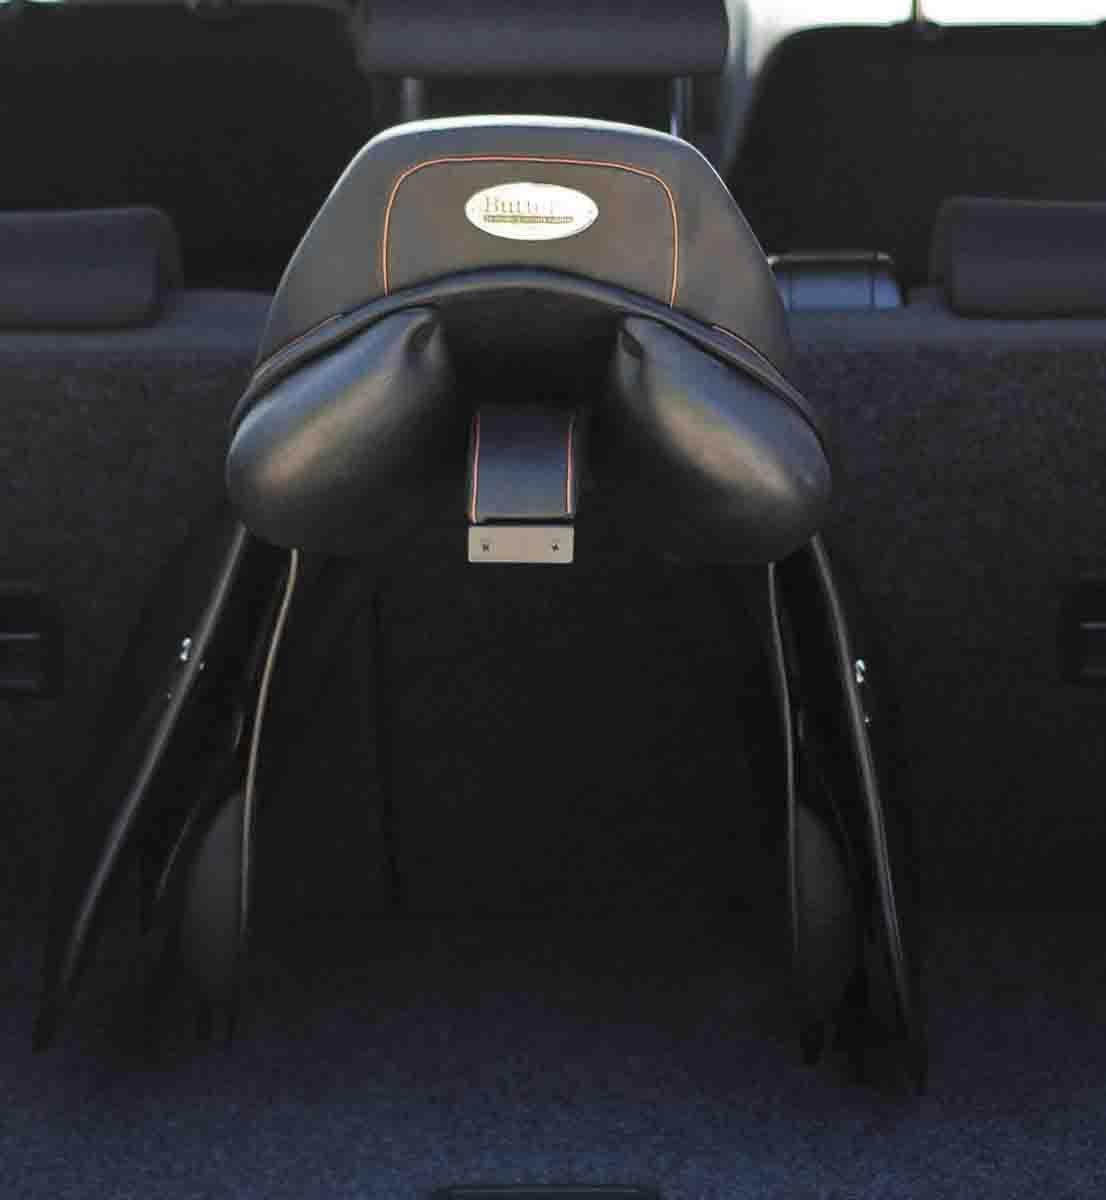 Sattelhalter Auto für Sättel Butterfly Sattelhalter DT-Saddlery | Autosattelhalter | Sattelhalter flexibel